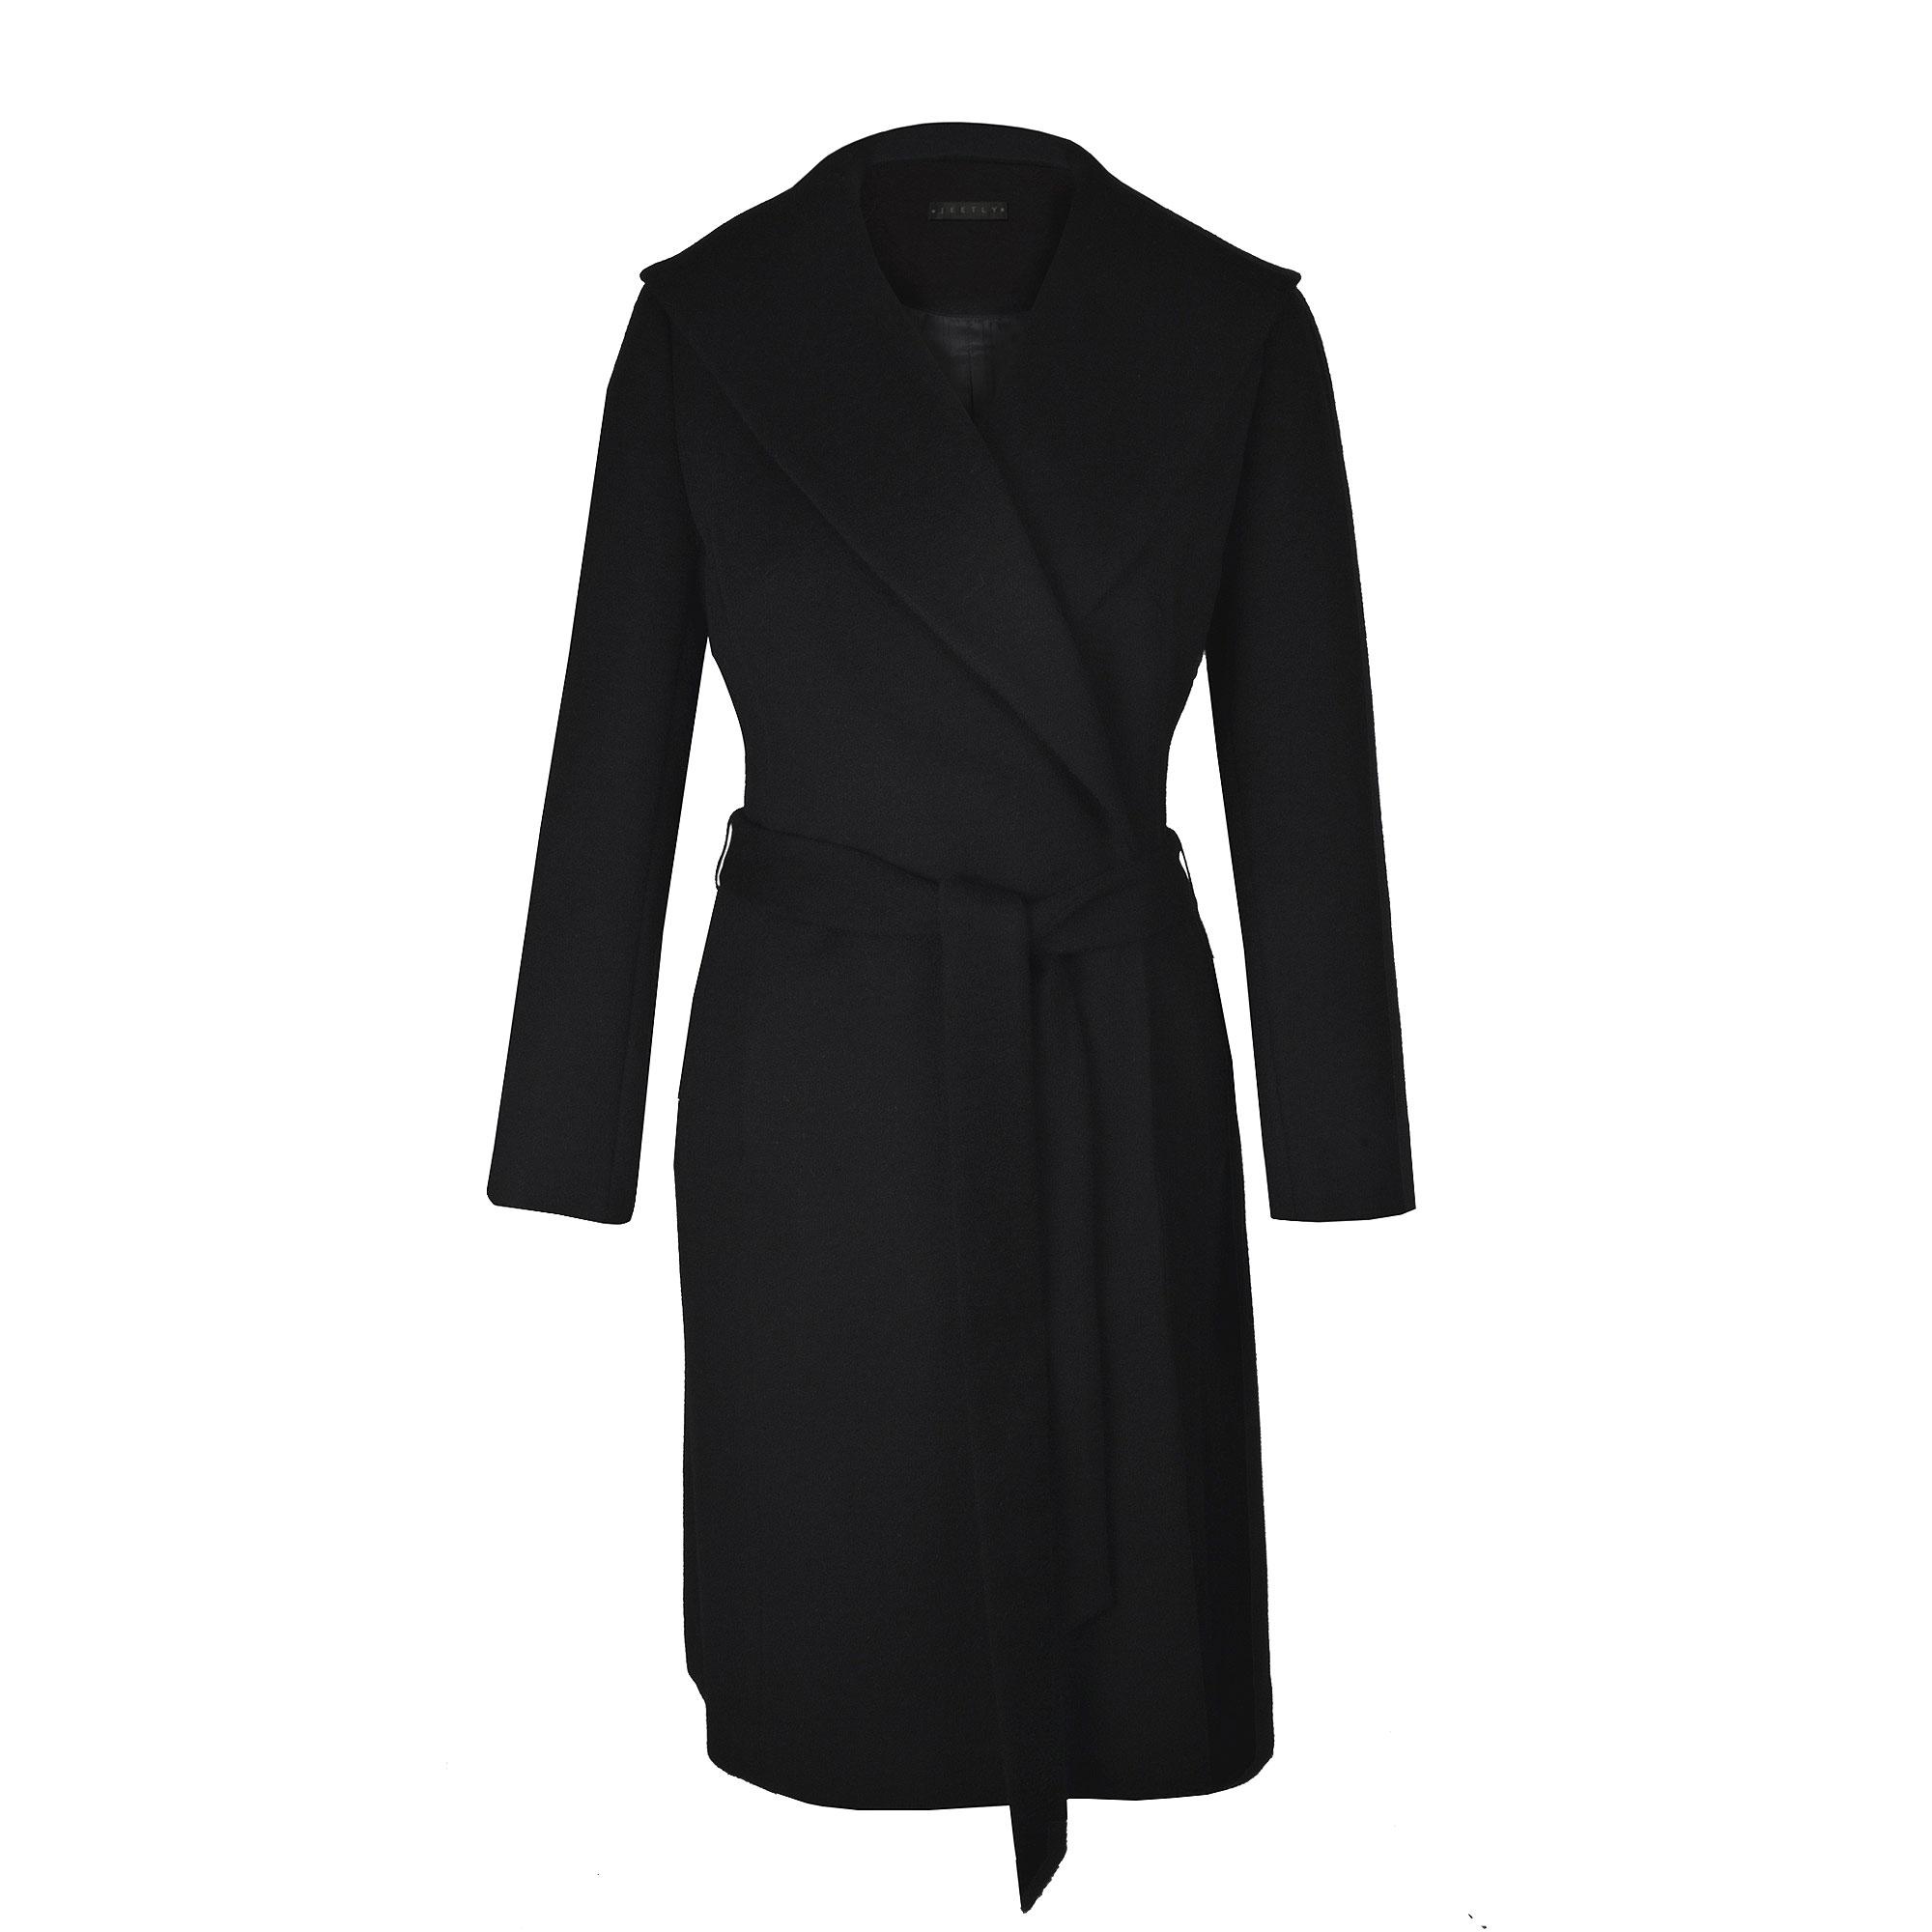 petite black coat XOSRLOC